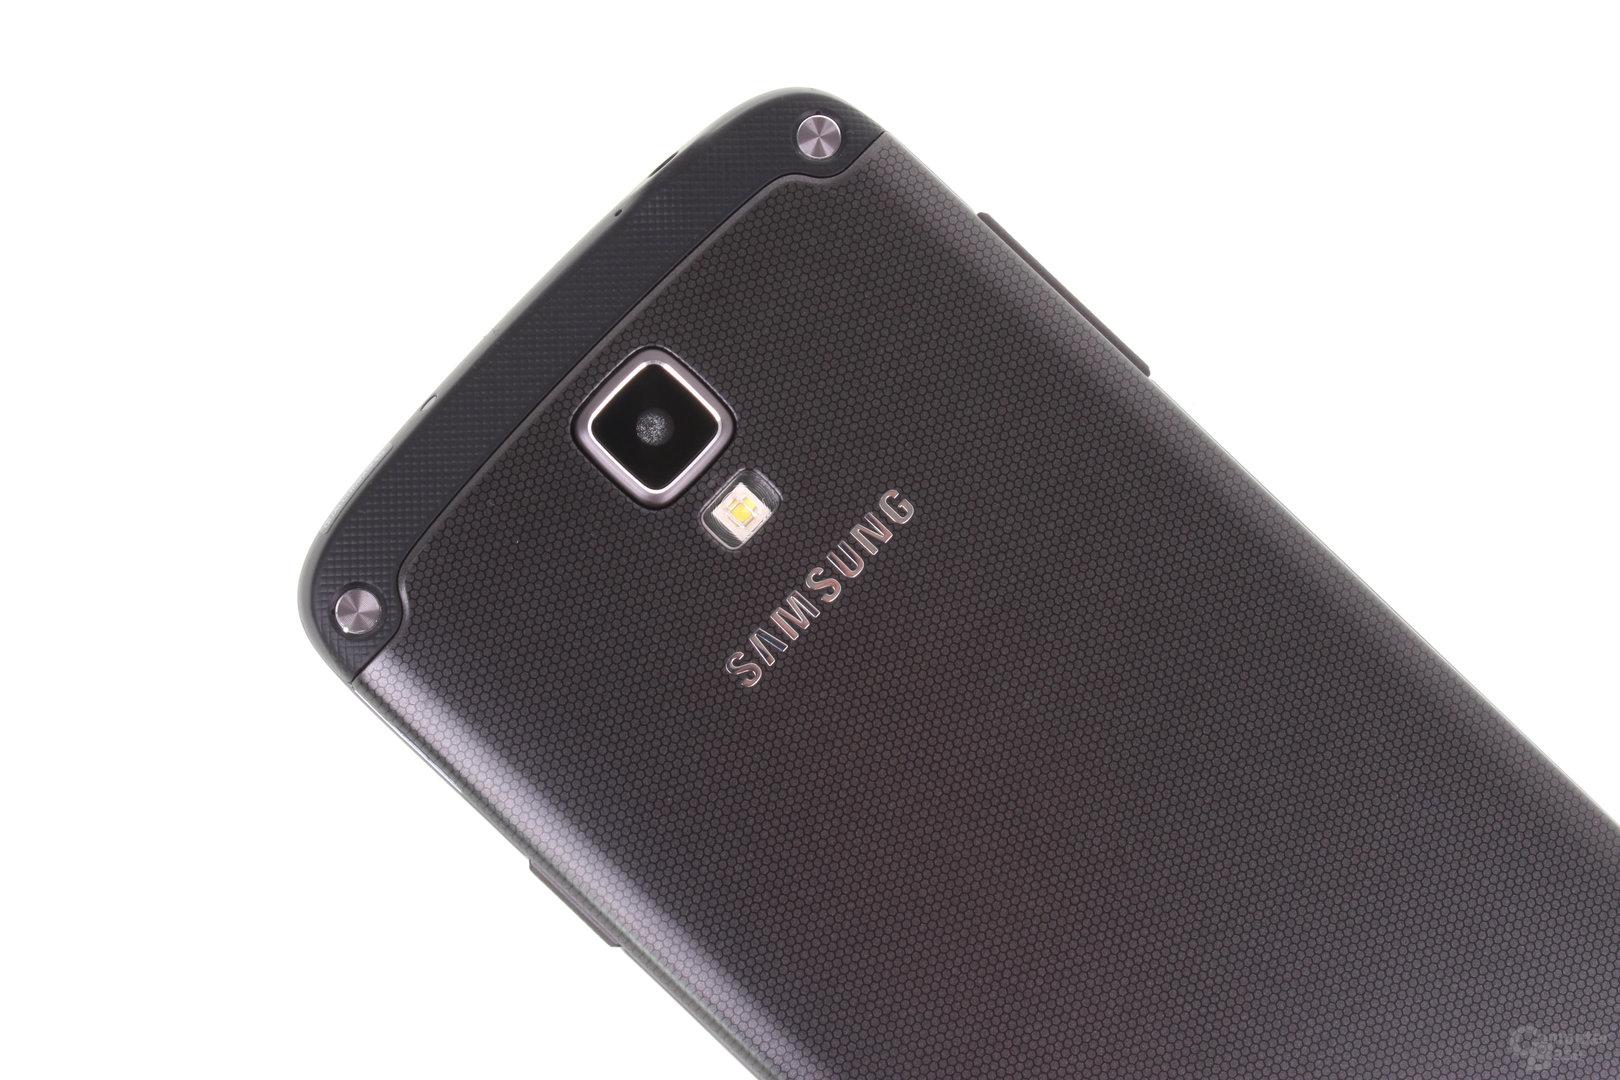 Die Kamera mit 8 Megapixeln